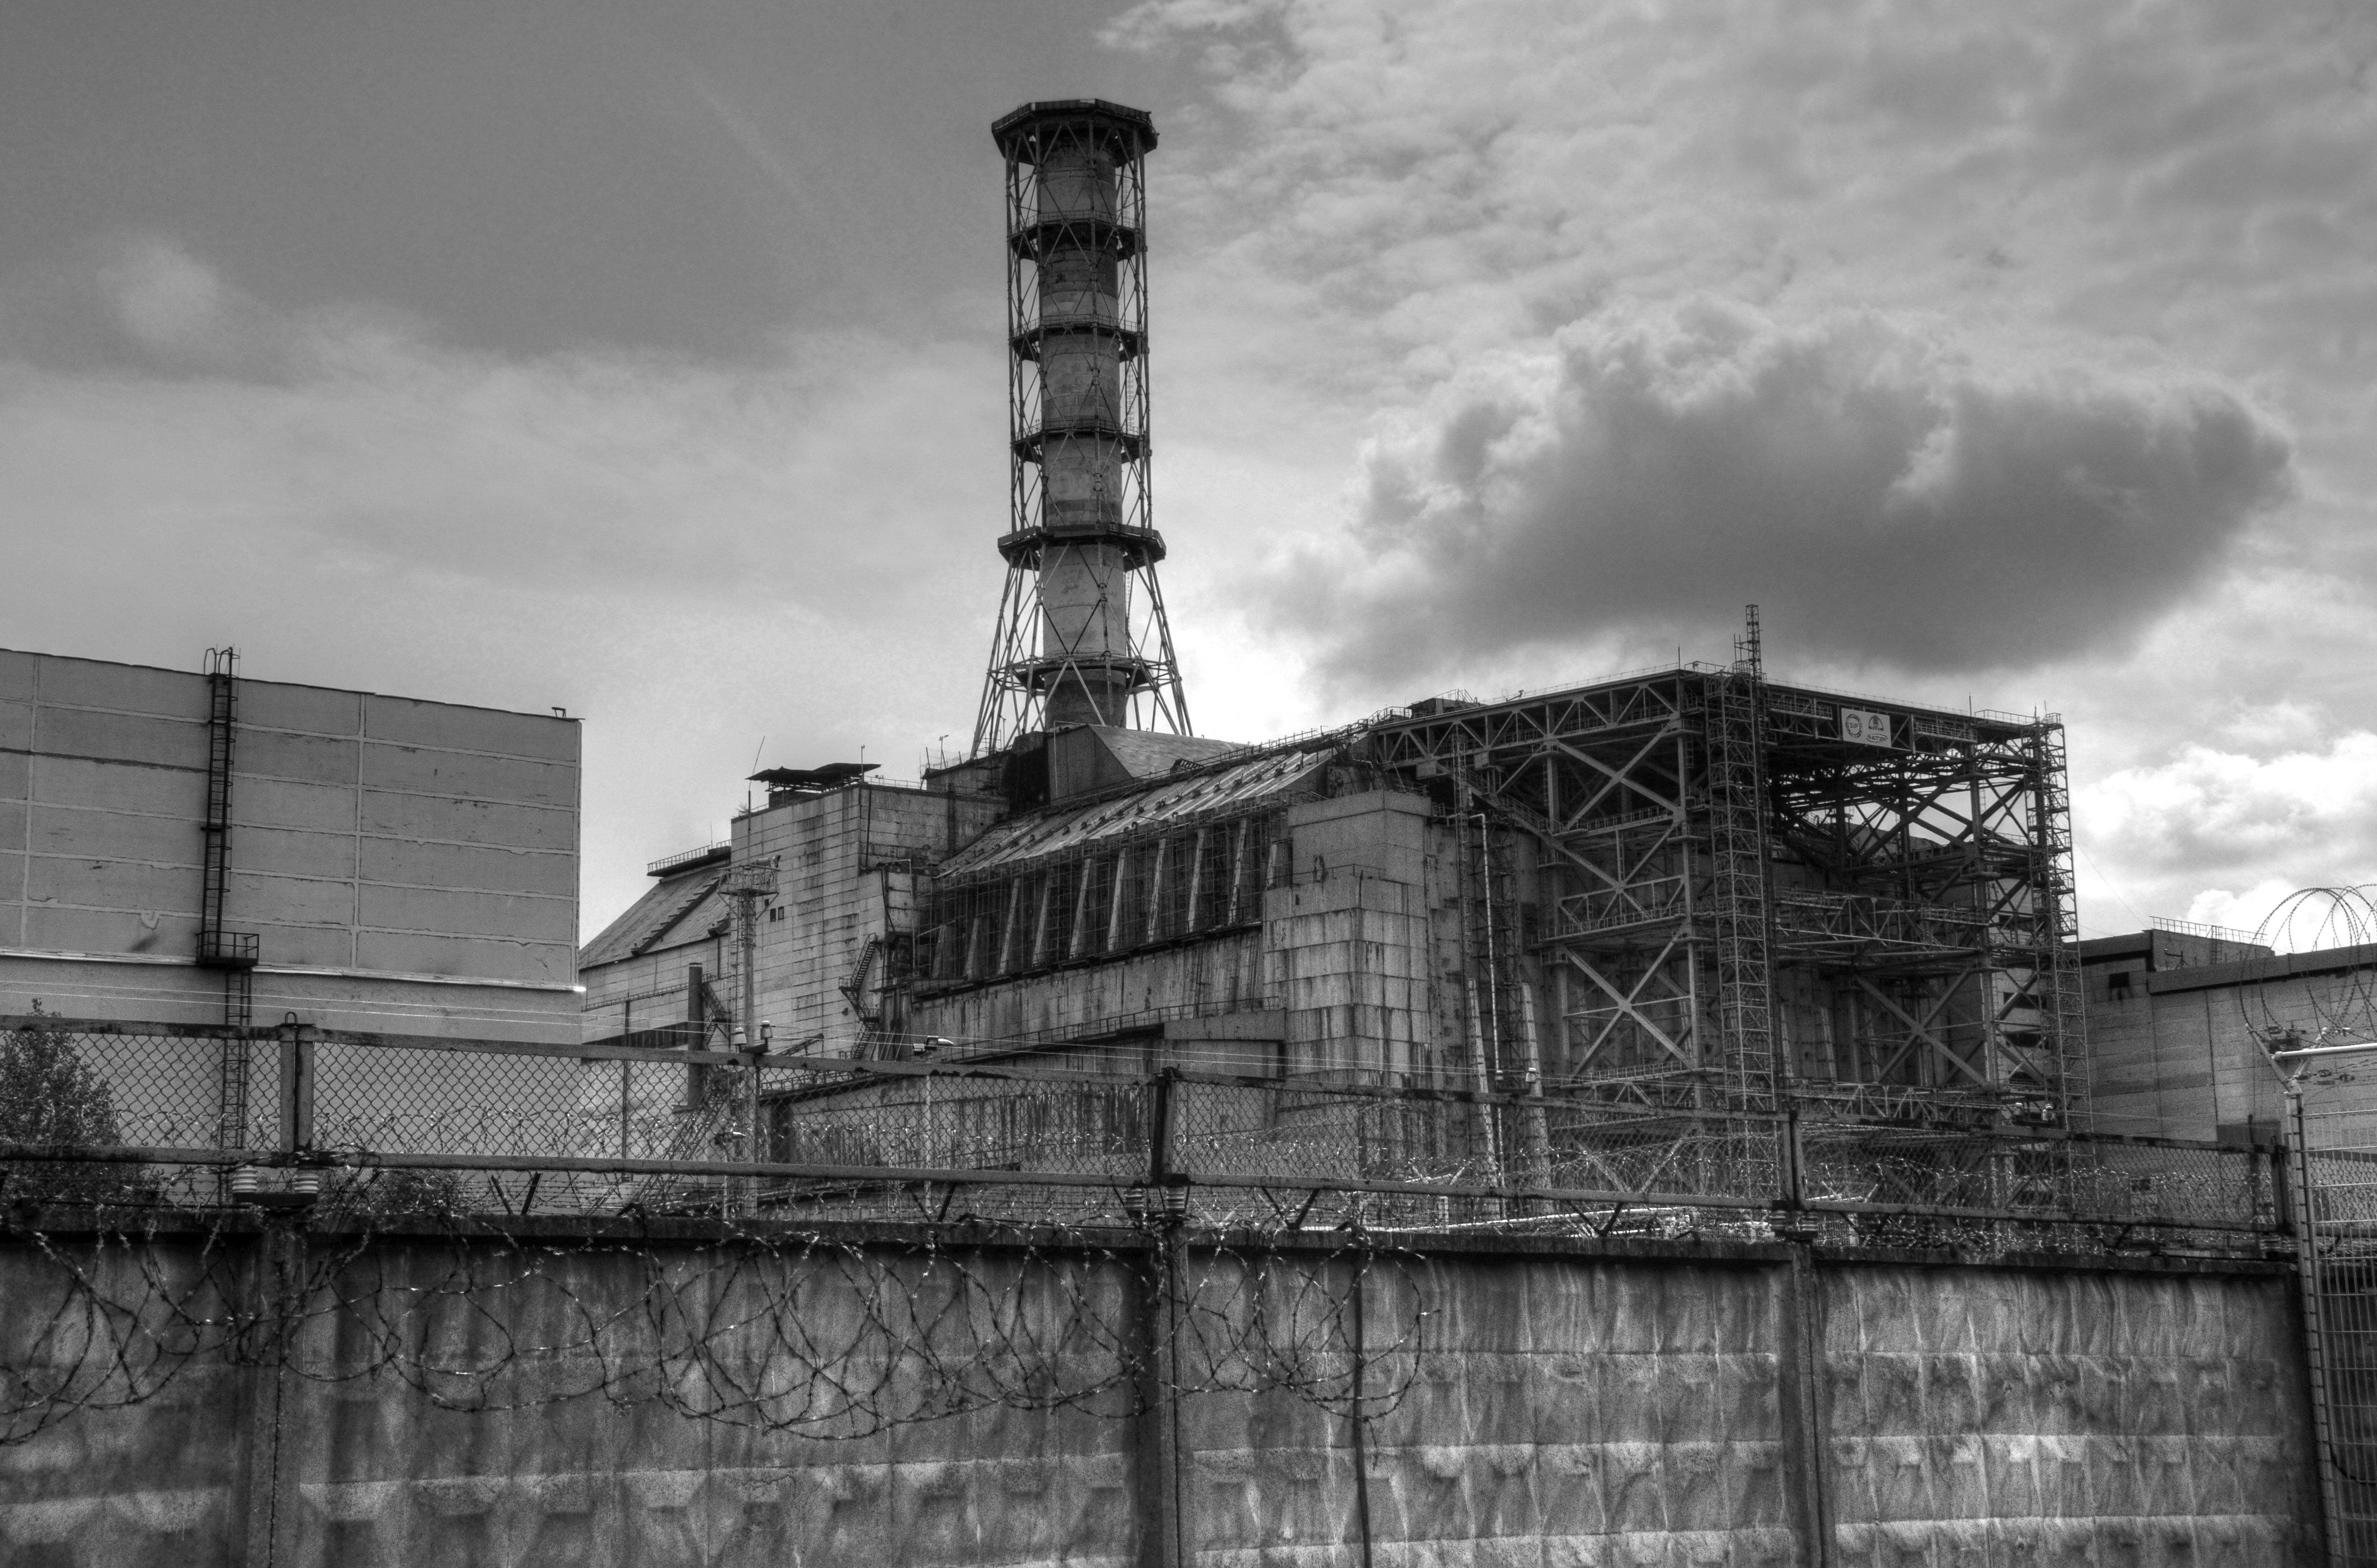 tschernobyl neue h lle f r den katastrophen reaktor des reaktors neue kleider. Black Bedroom Furniture Sets. Home Design Ideas